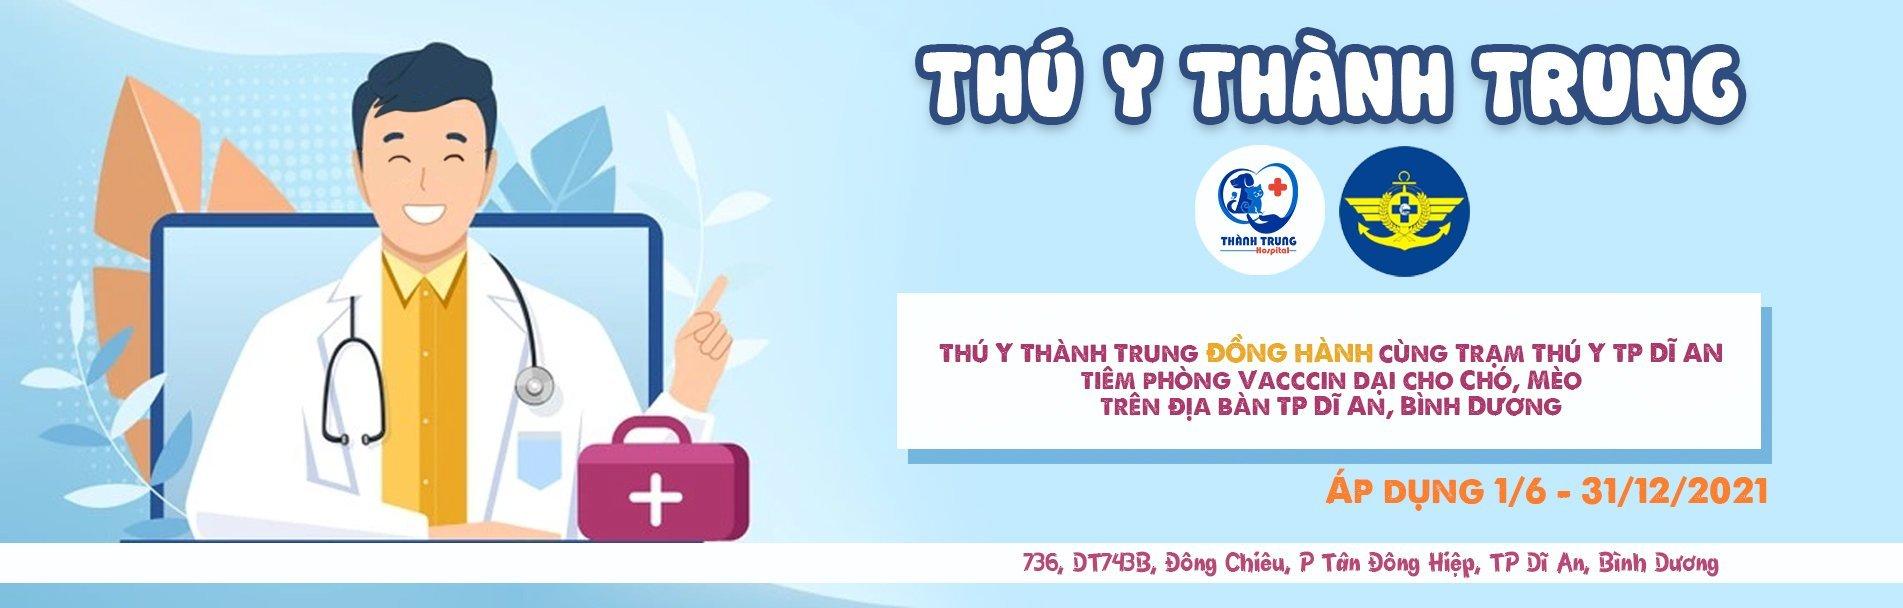 Thuythanhtrung-banner-dong-hanh-binh-duong